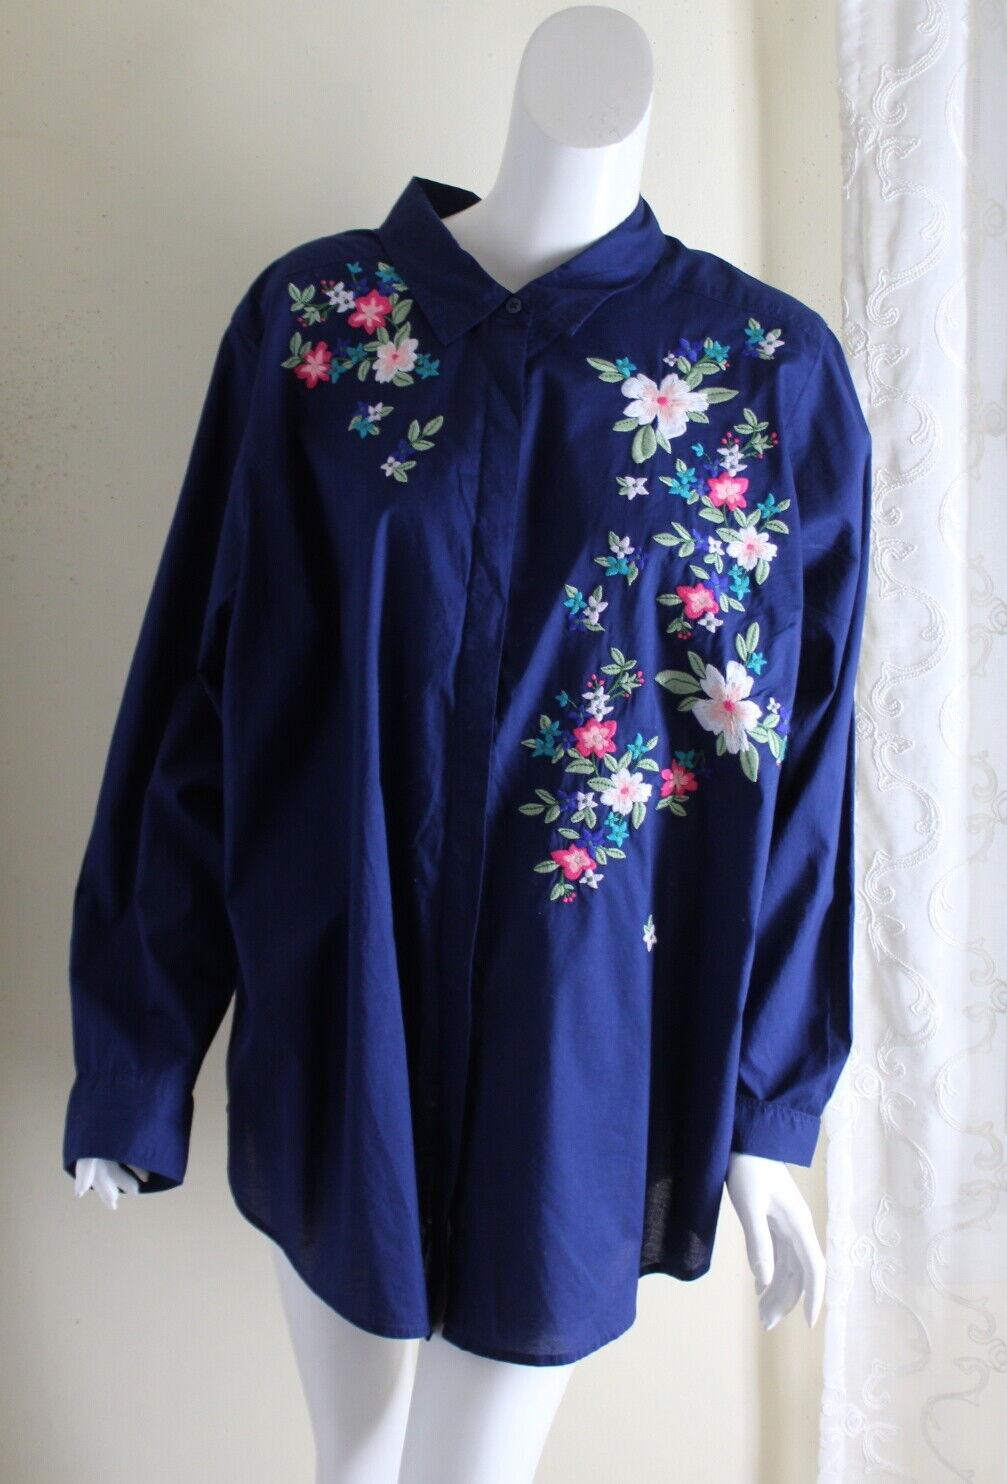 Liz Claiborne -Sz 2X Navy Floral Art-to-Wear Embroiderot Folk Blouse Shirt Top